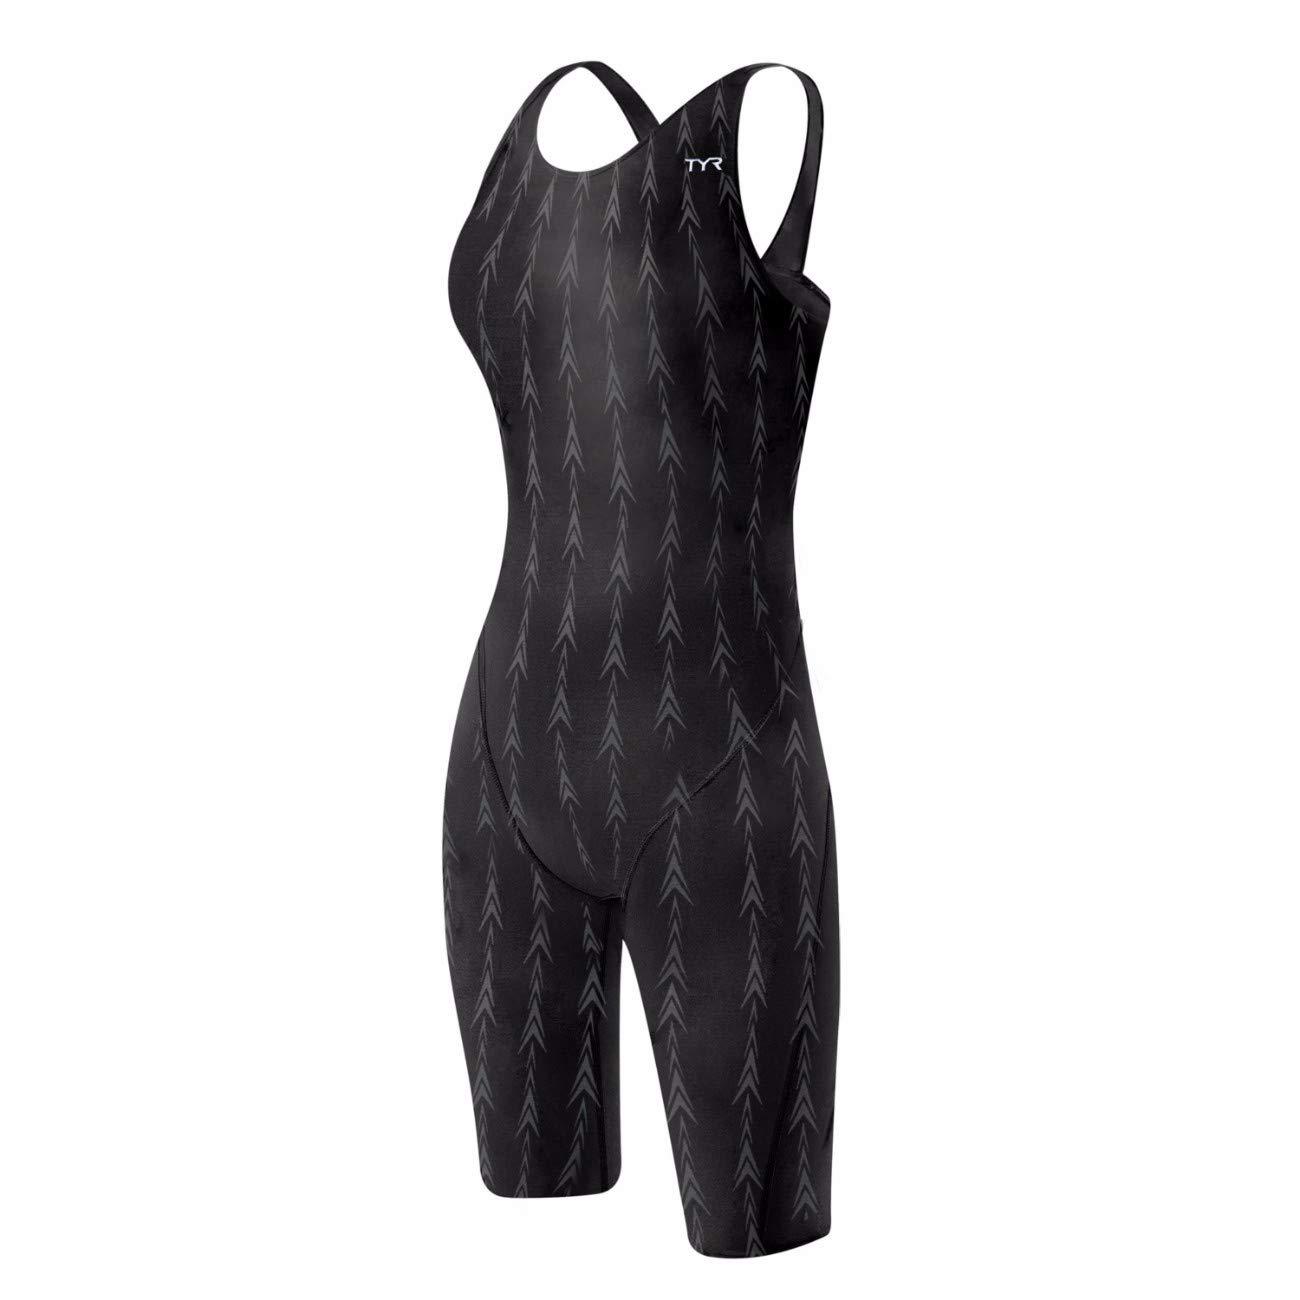 TYR Womens Fusion 2 Short John Swim Suit